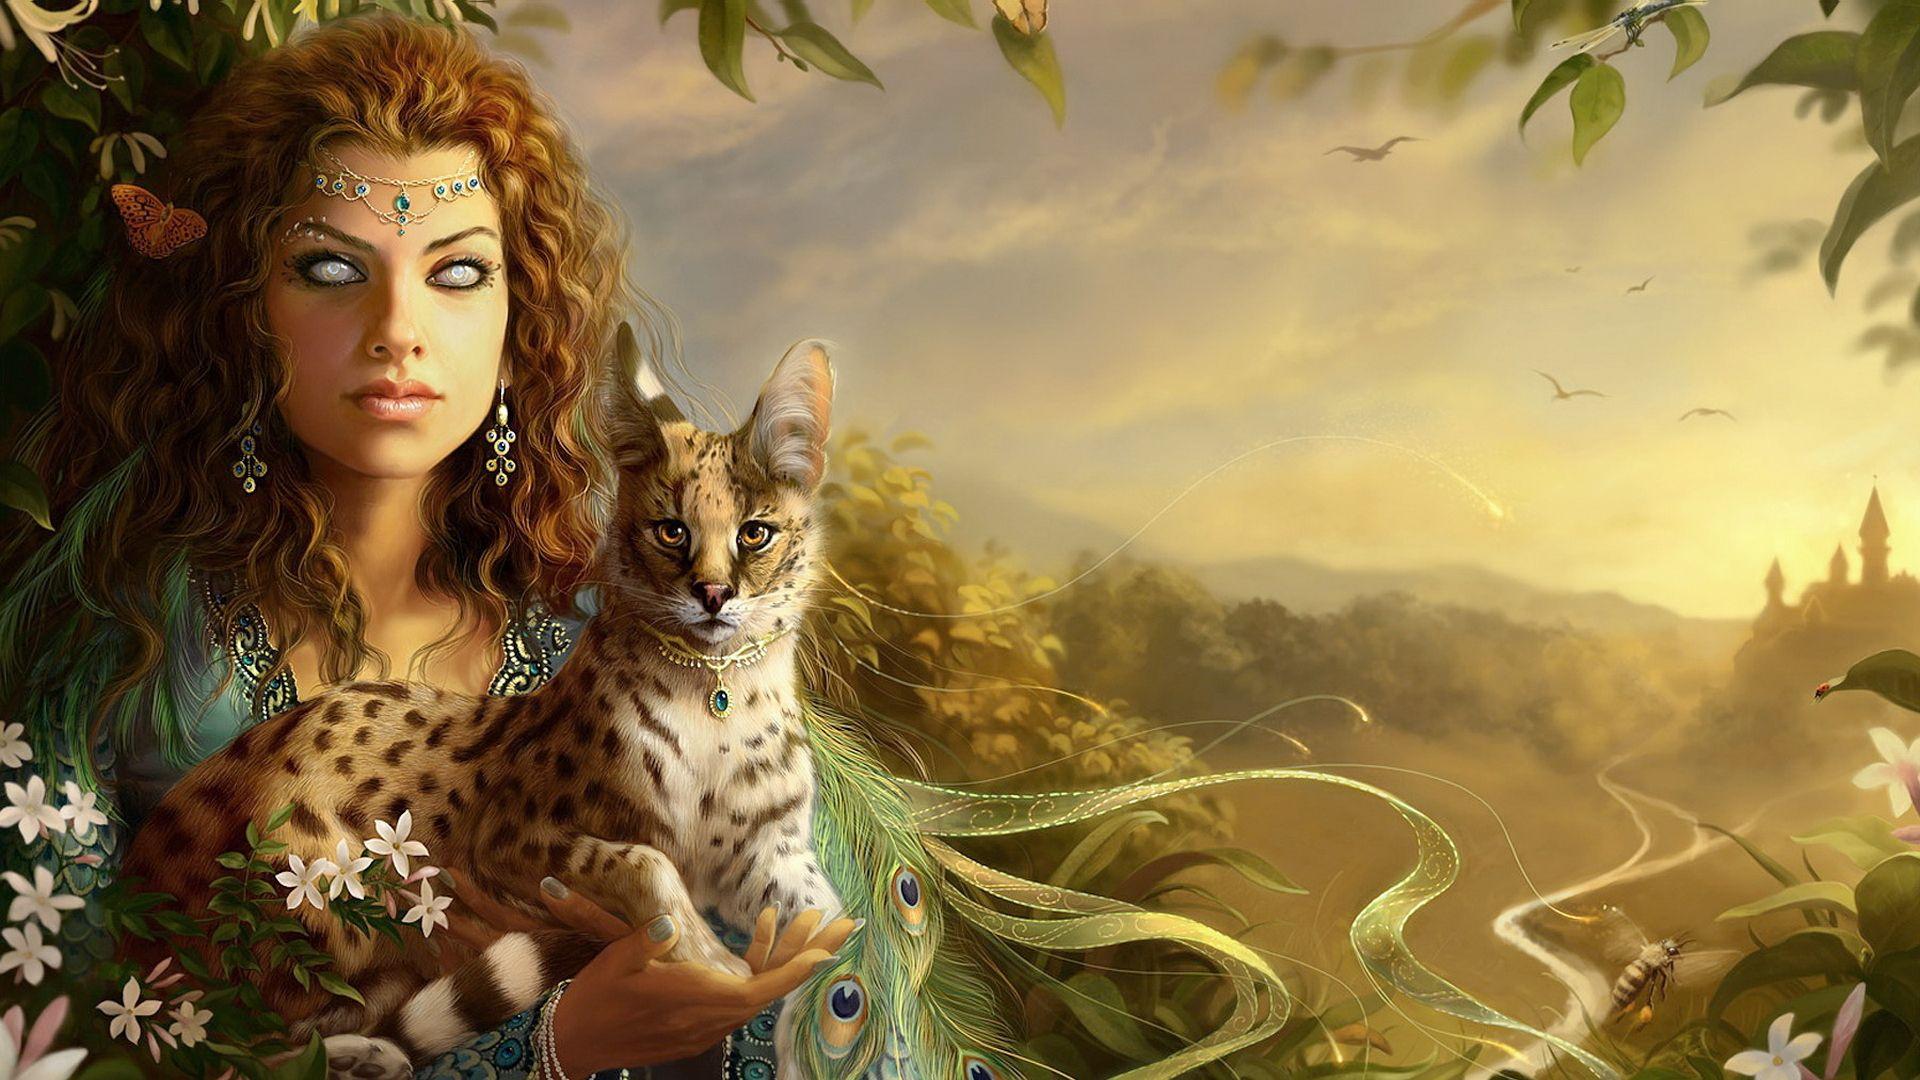 Ereleia The Twilight Diamond Goddess Of Art And Beauty Advent Of The Mists